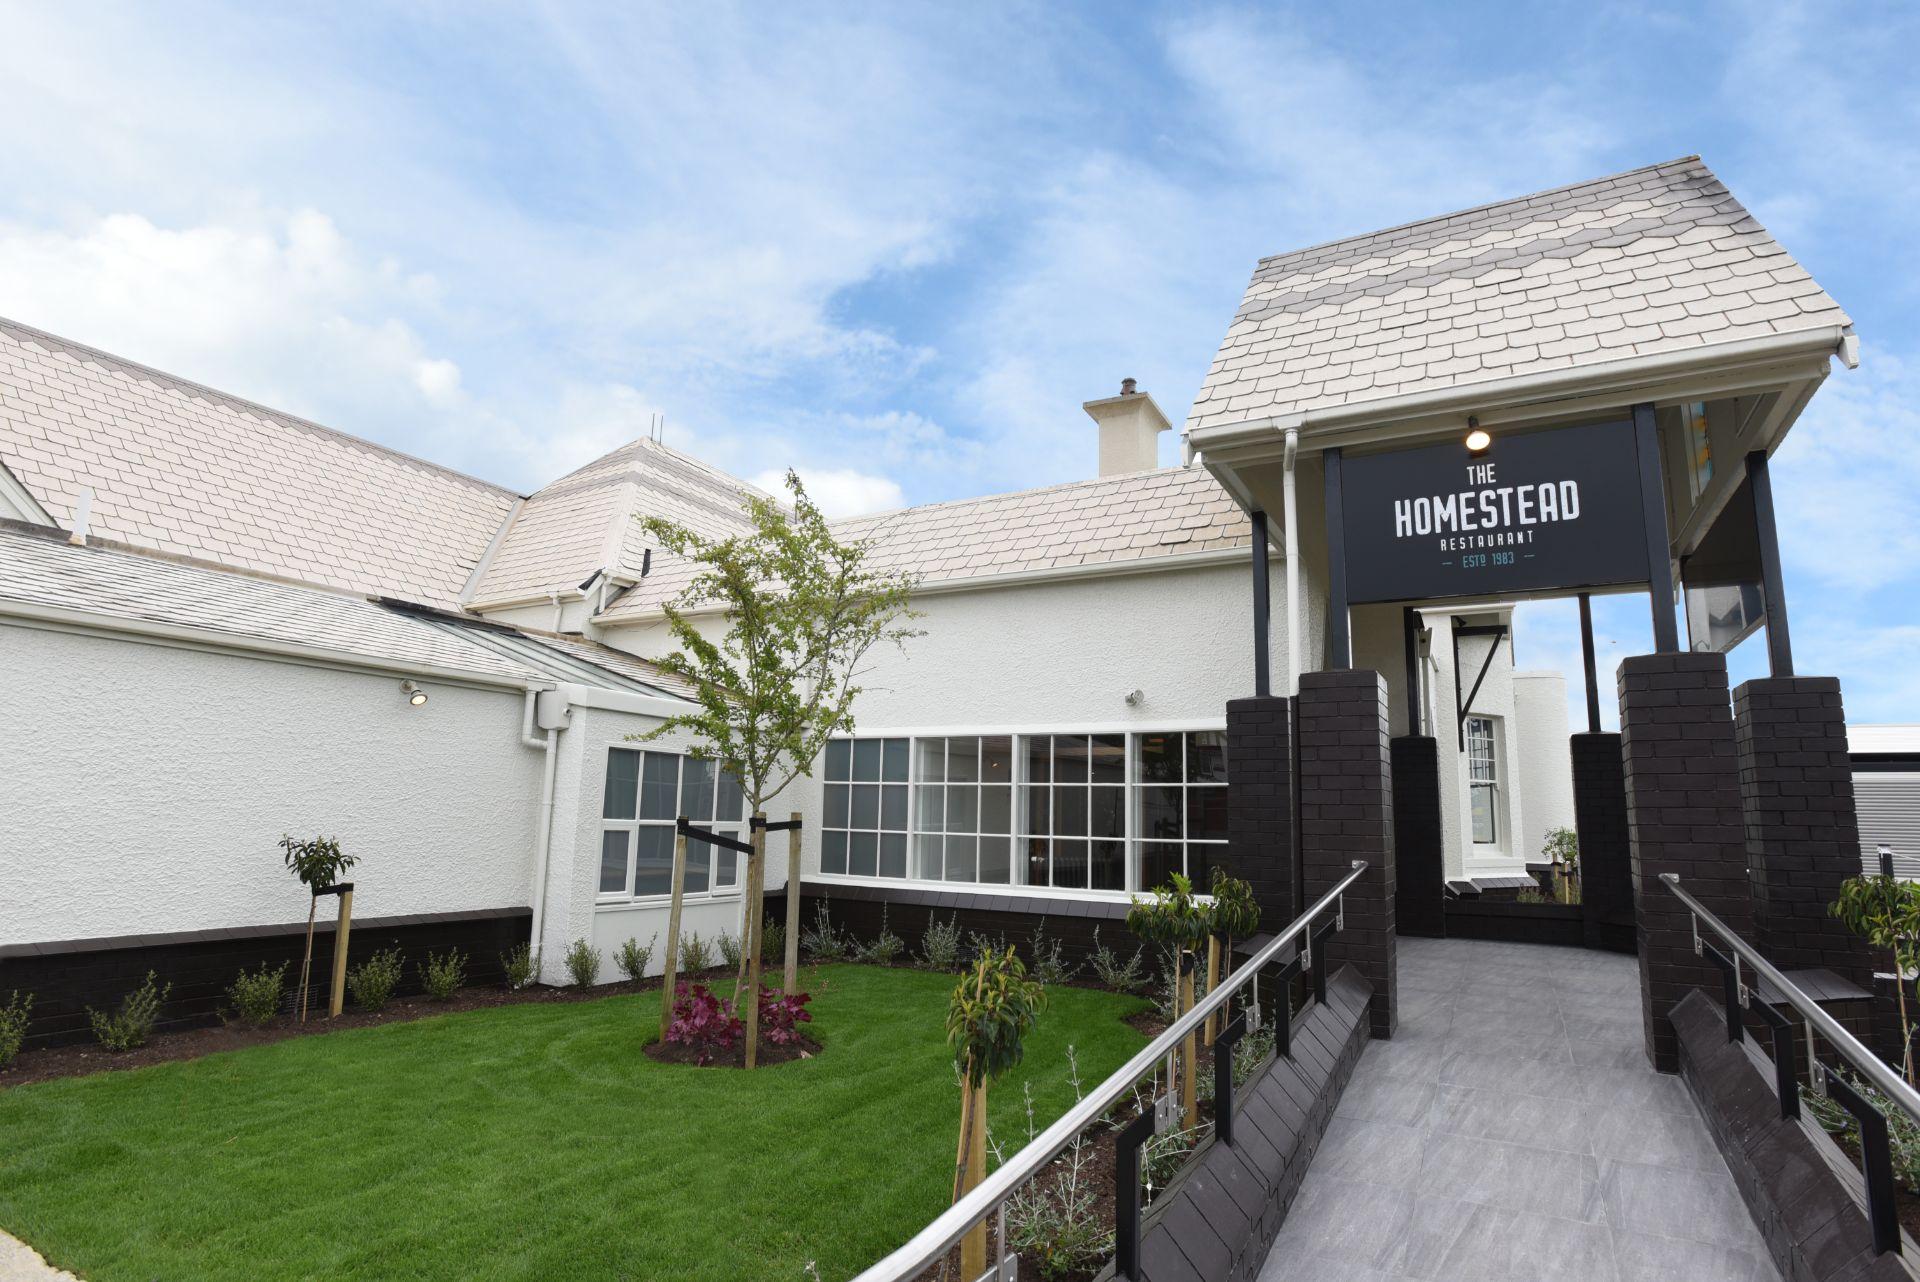 Main entrance to The Homestead Restaurant Invercargill